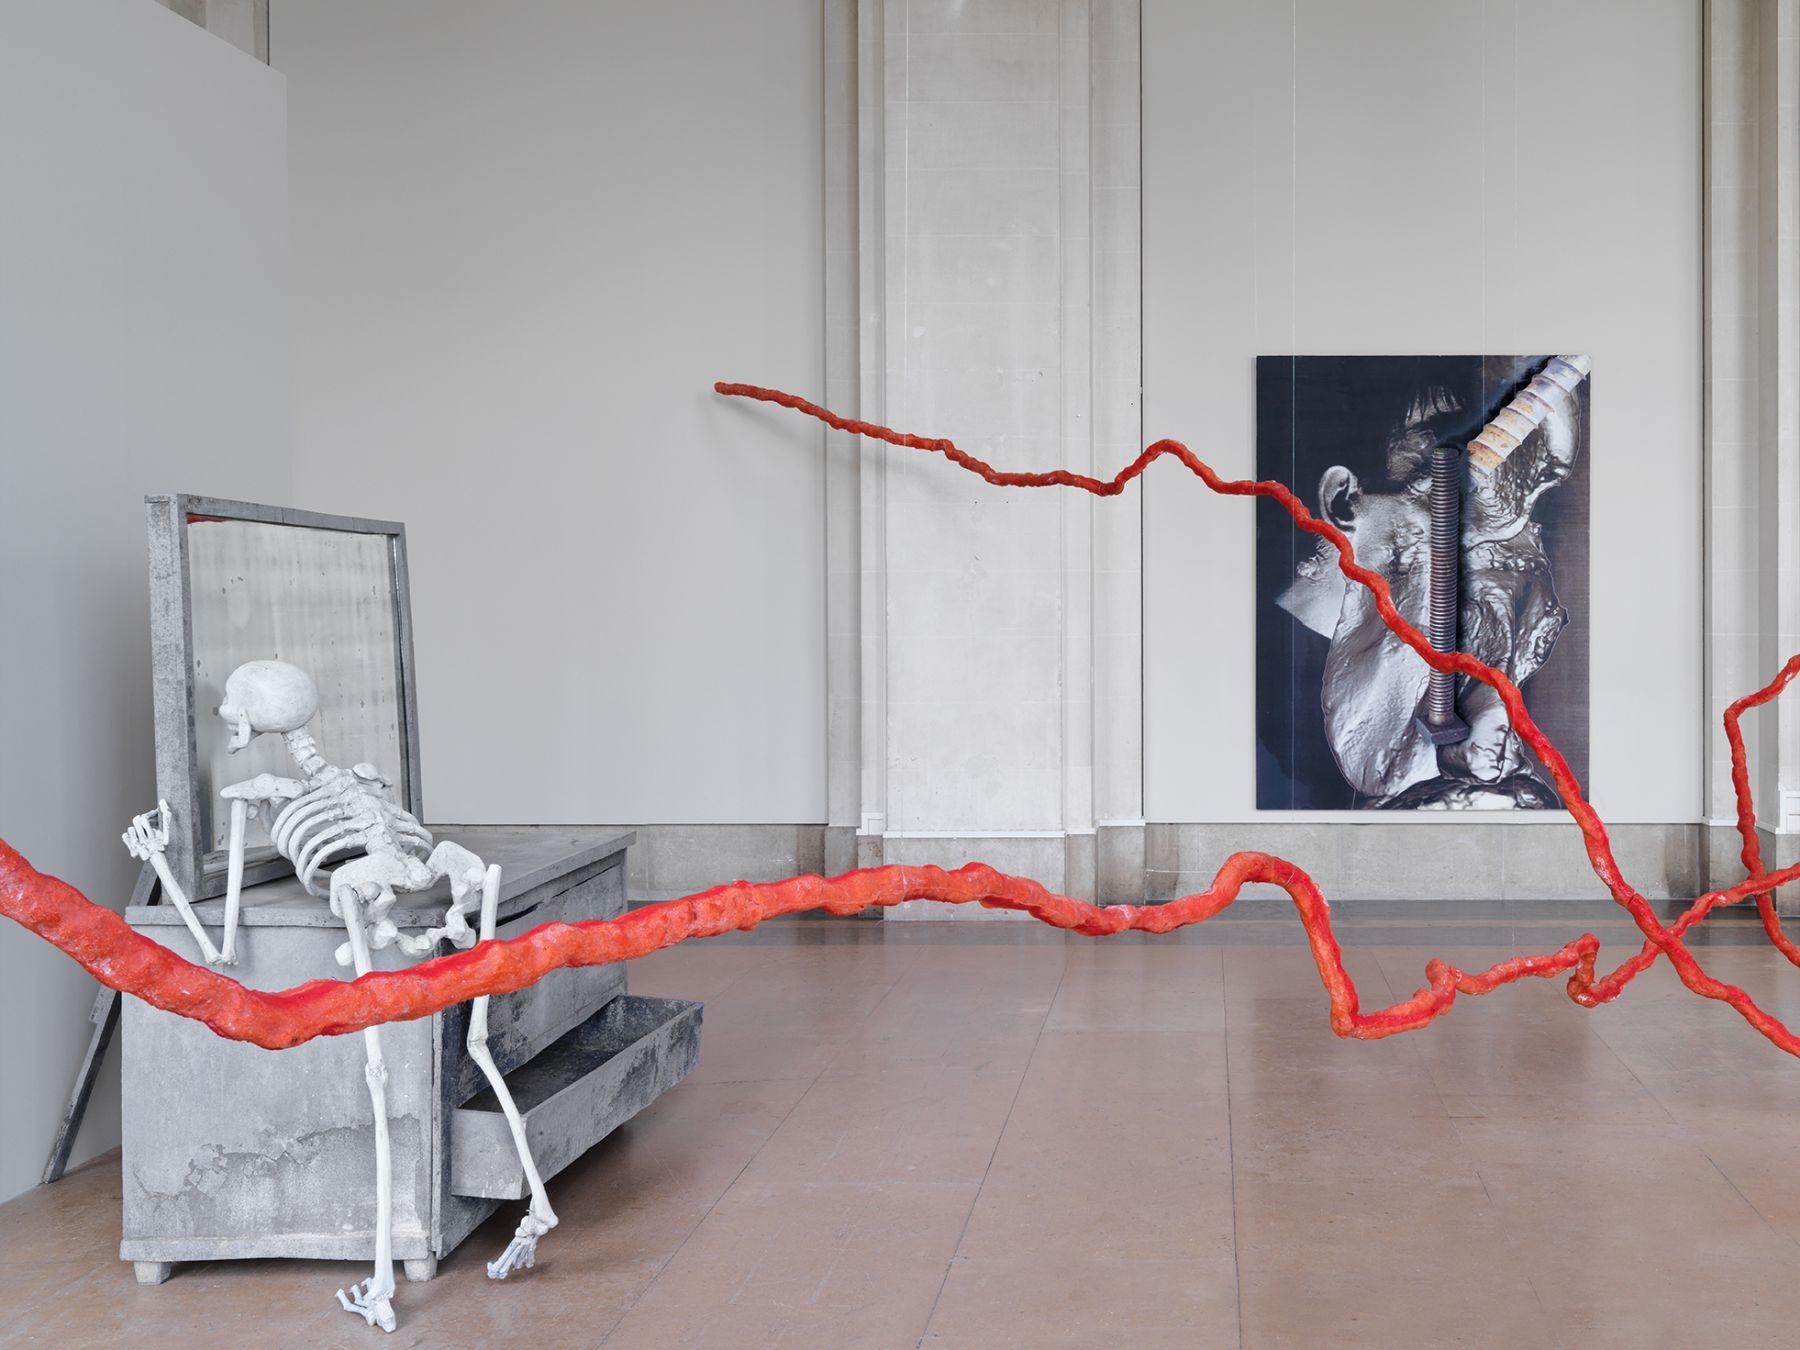 Installation view,Urs Fischer – False Friends,Museum of Art and History of Geneva, Austria, 2016